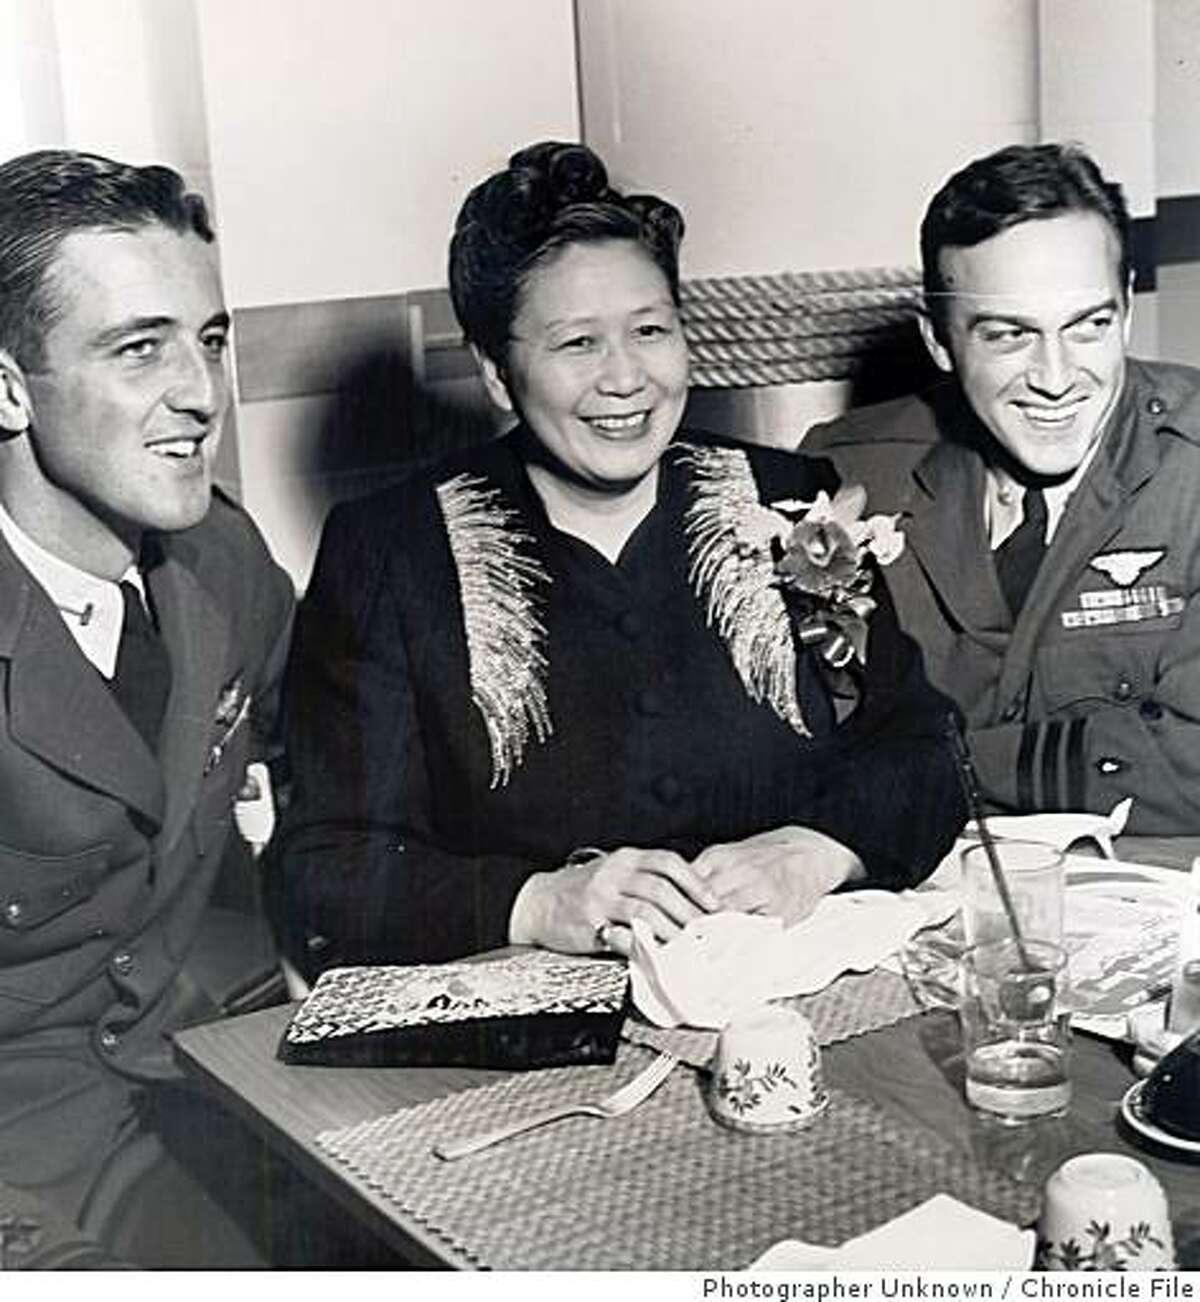 wayback04.jpg Dec. 12, 1945 - Dr. Margaret Jessie Chung, known as